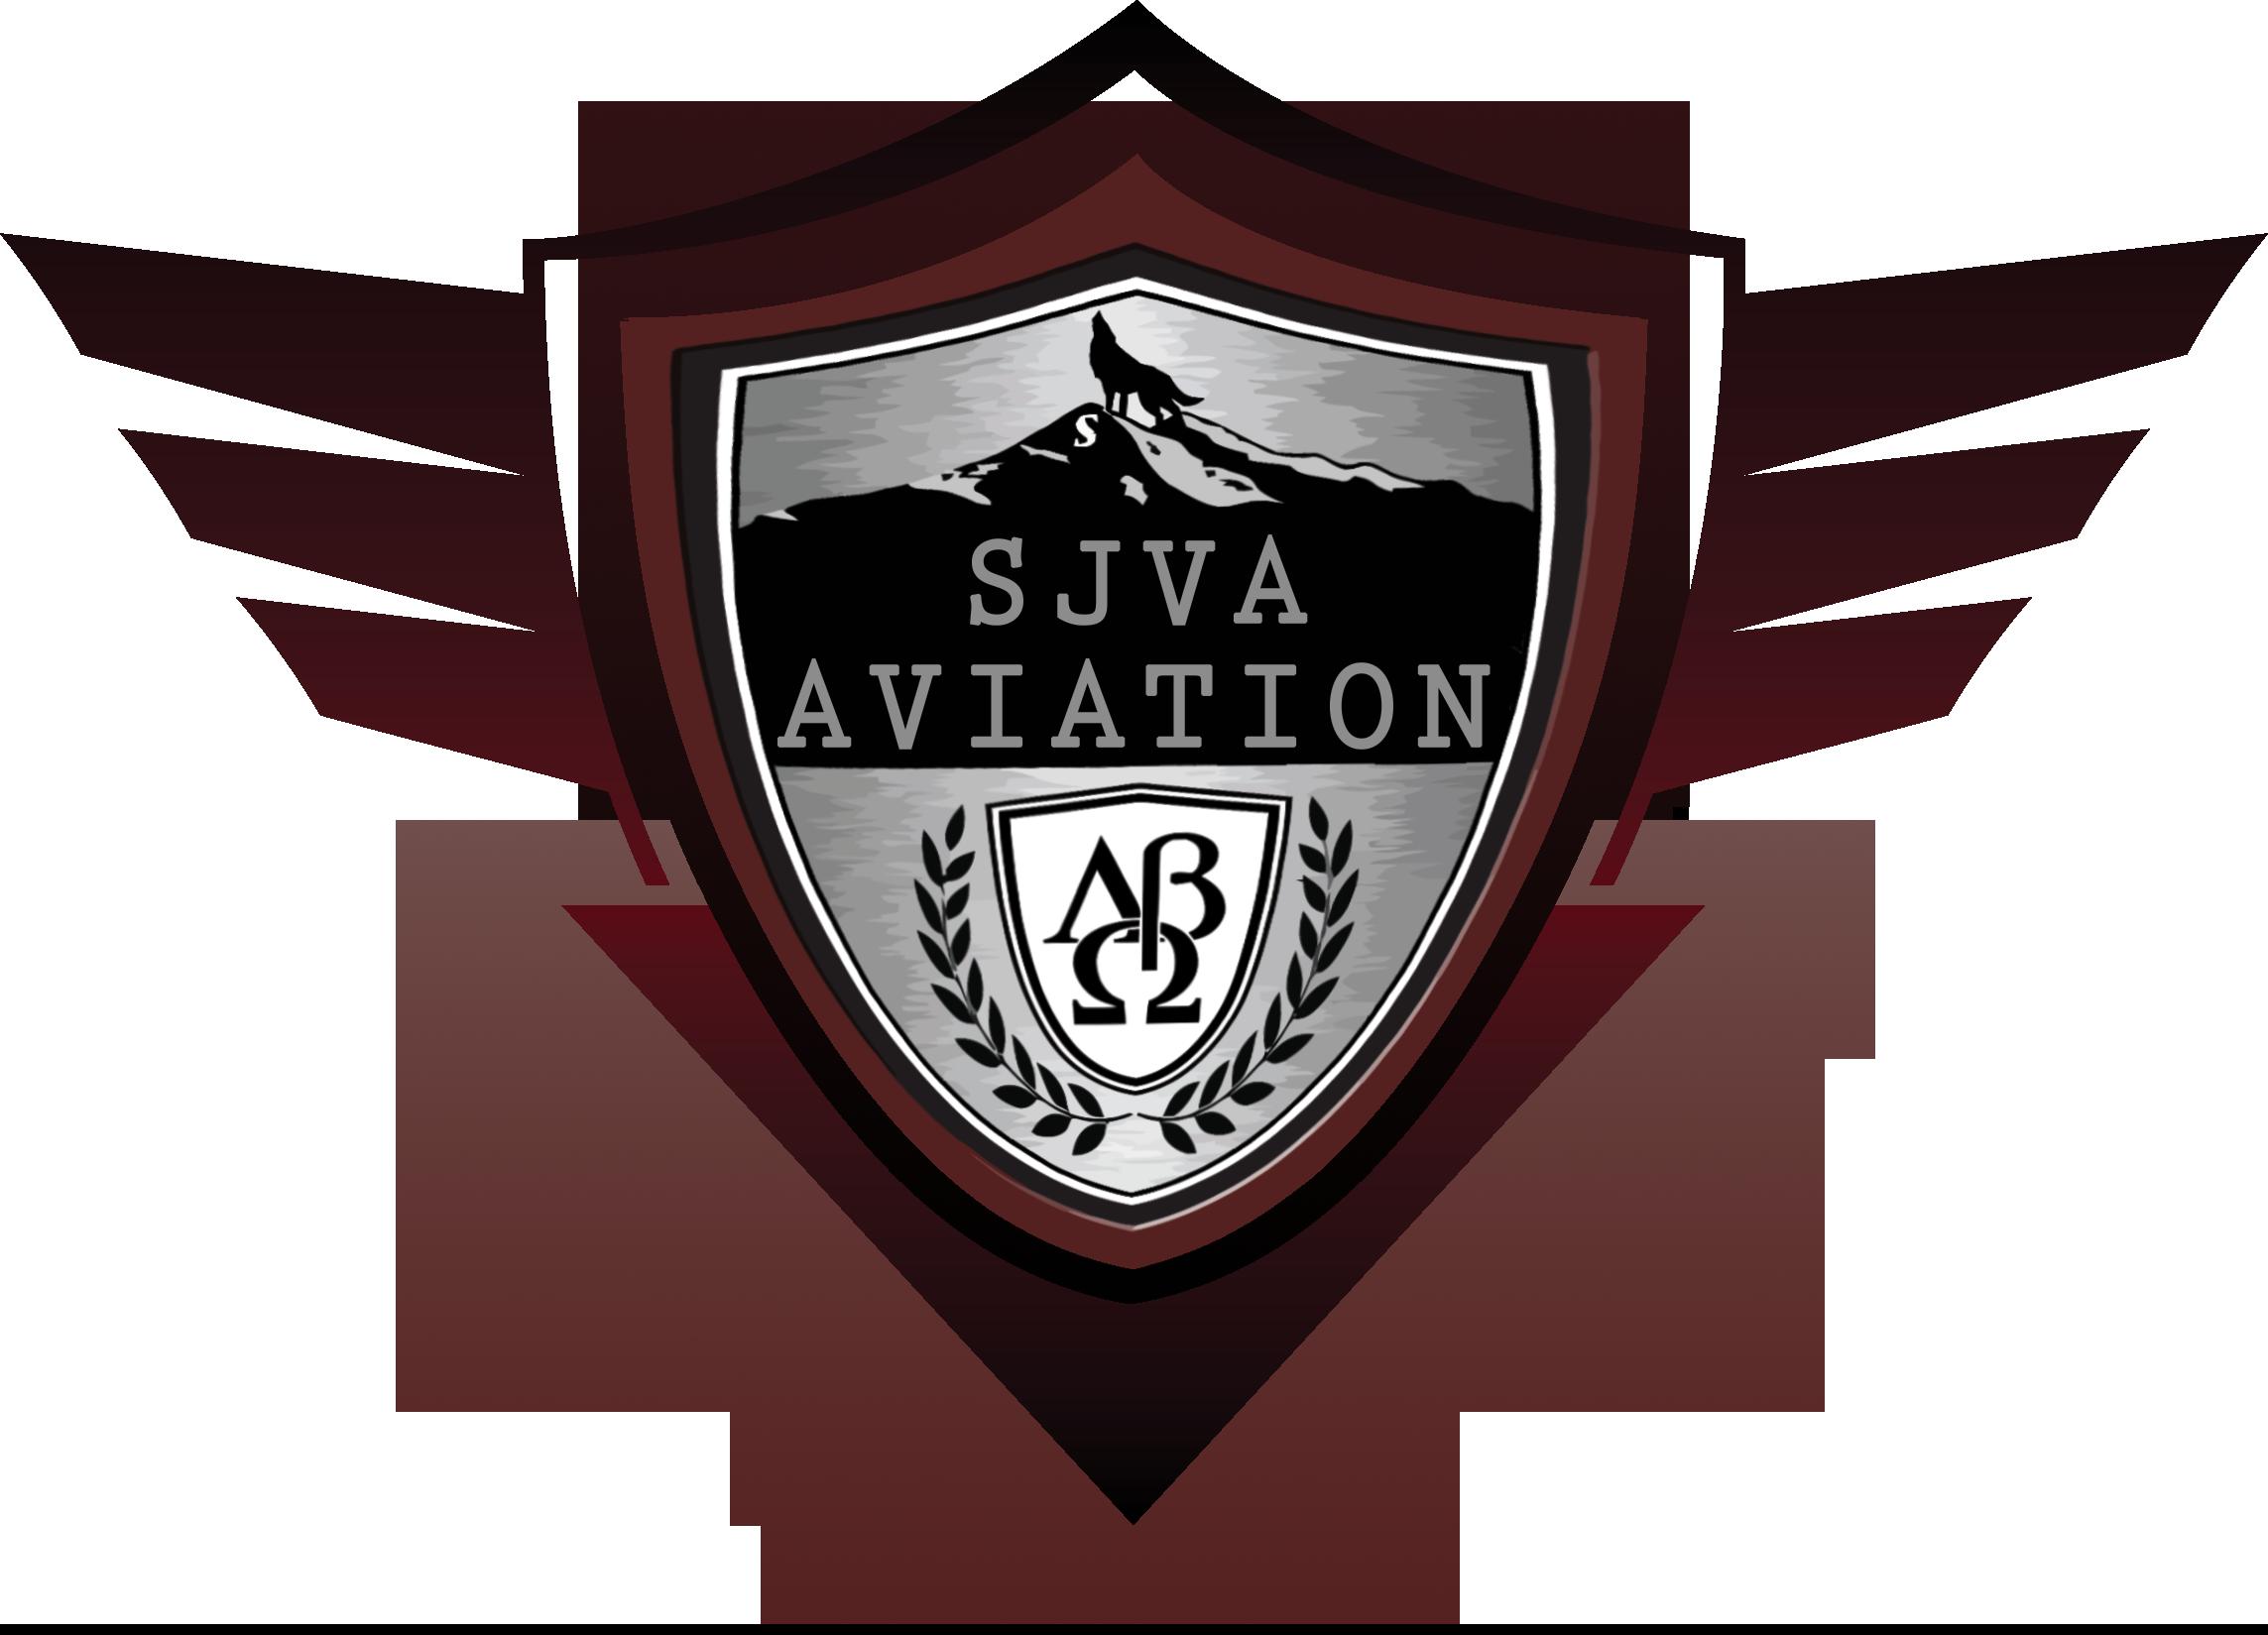 SJVA Aviation on White-no background (2)